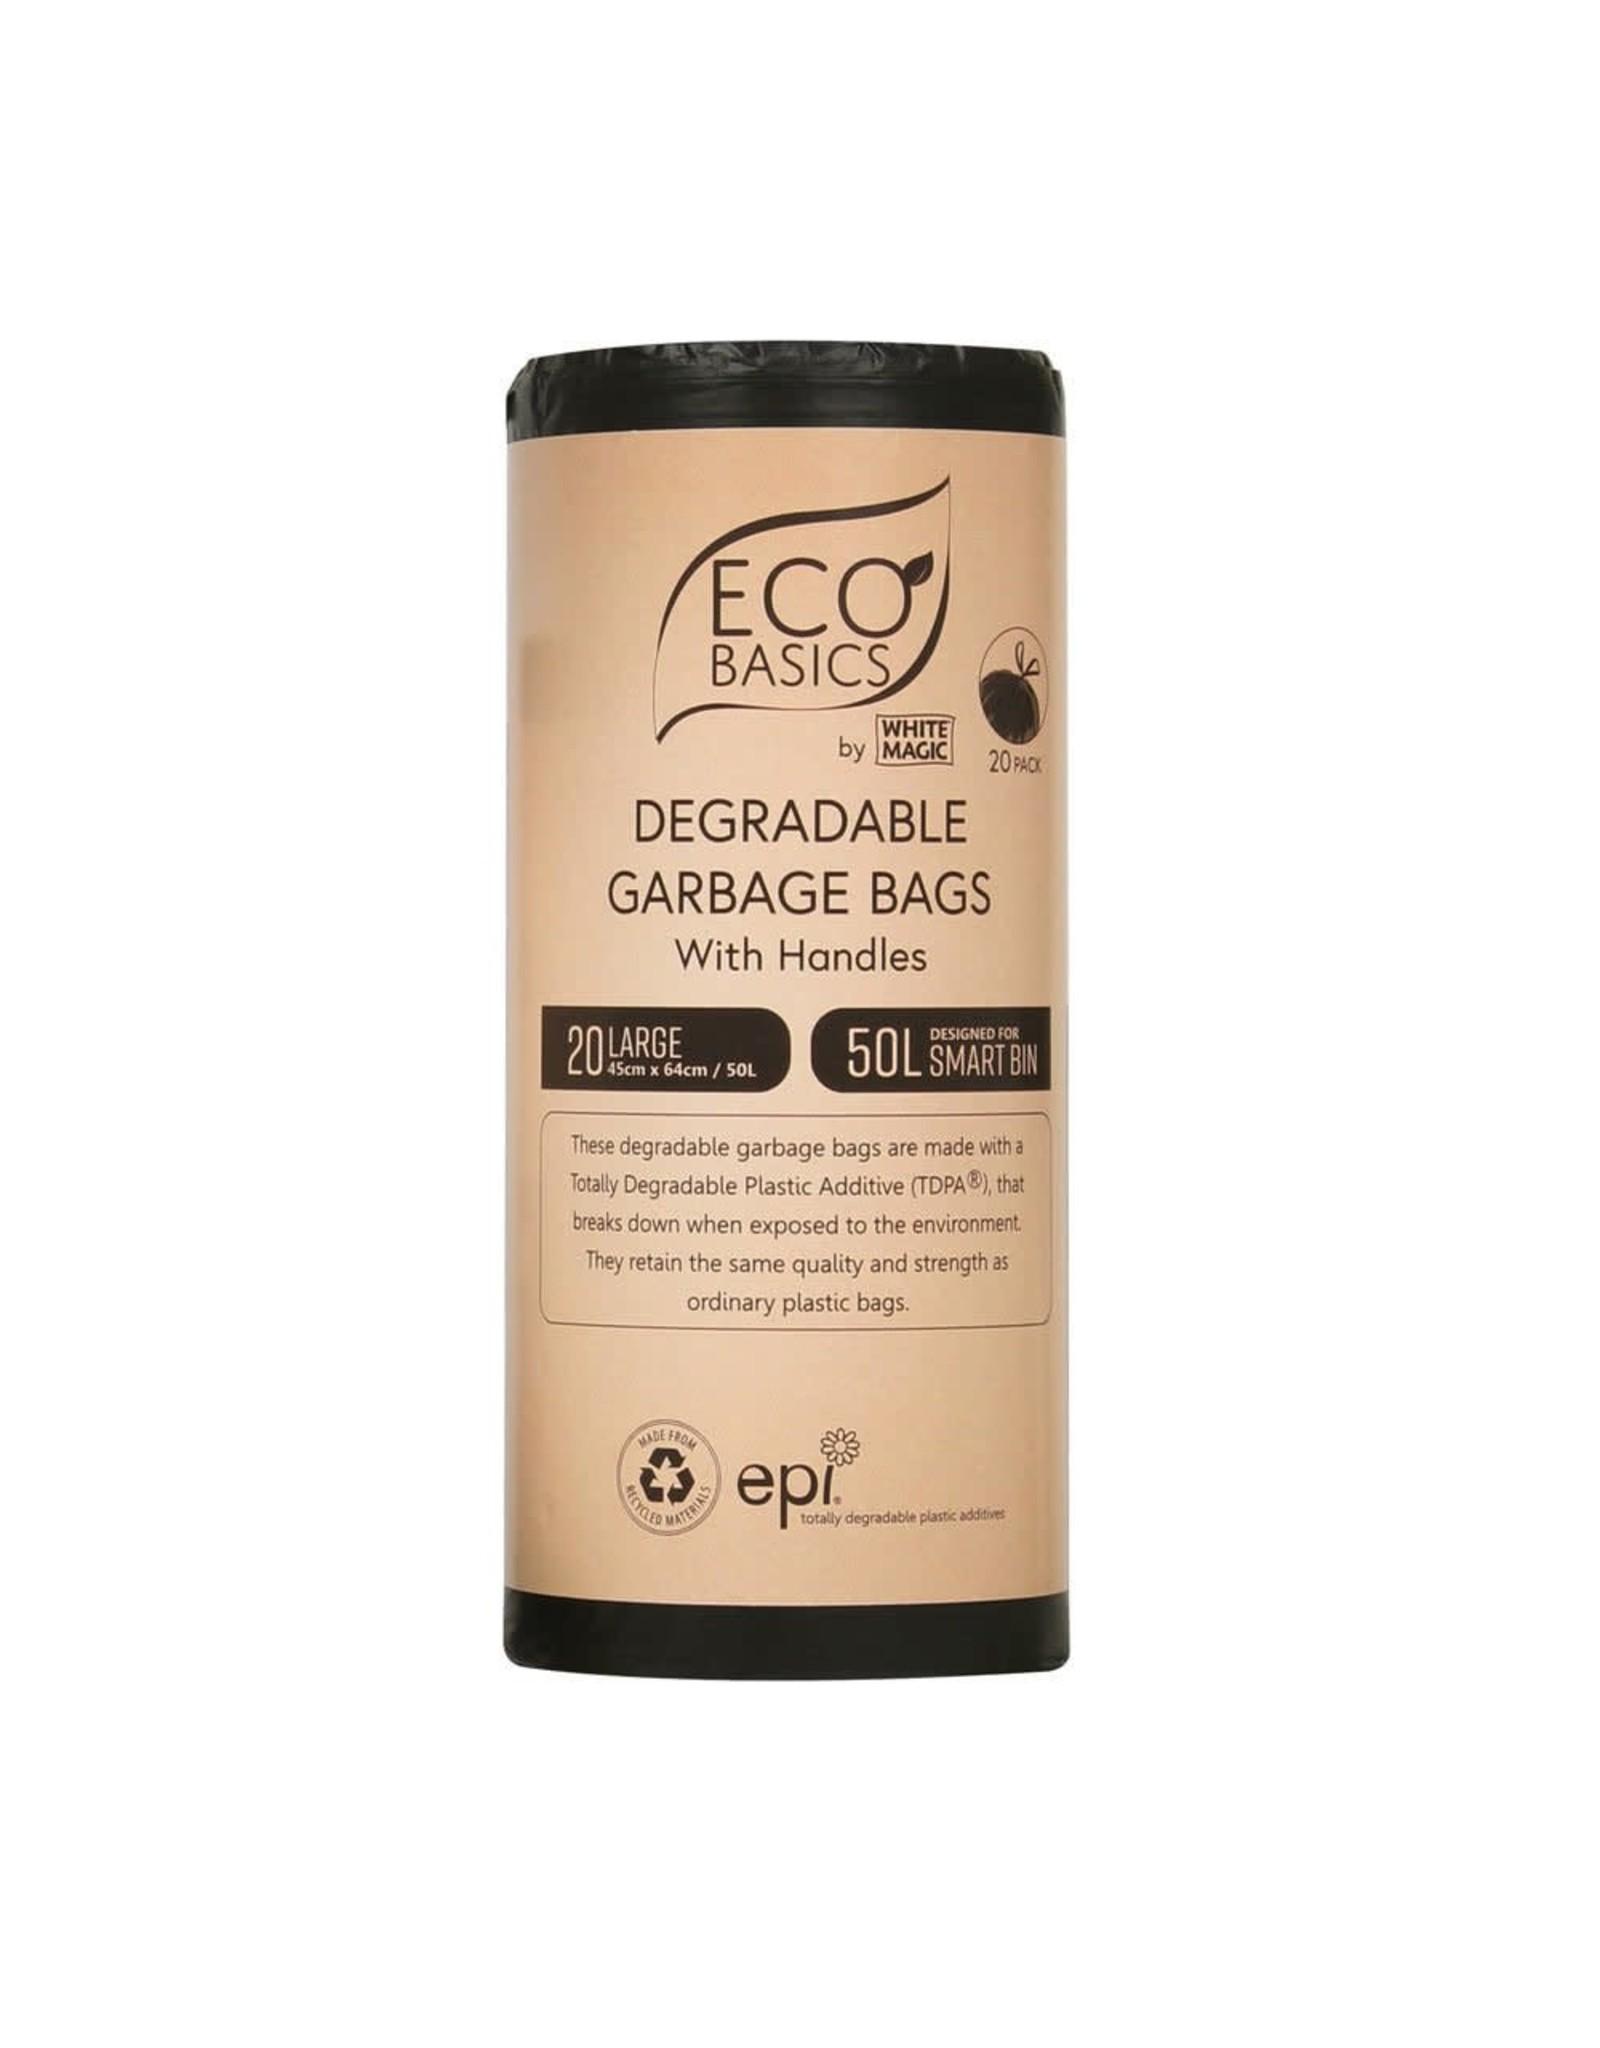 Eco Basics Degradable Garbage Bags